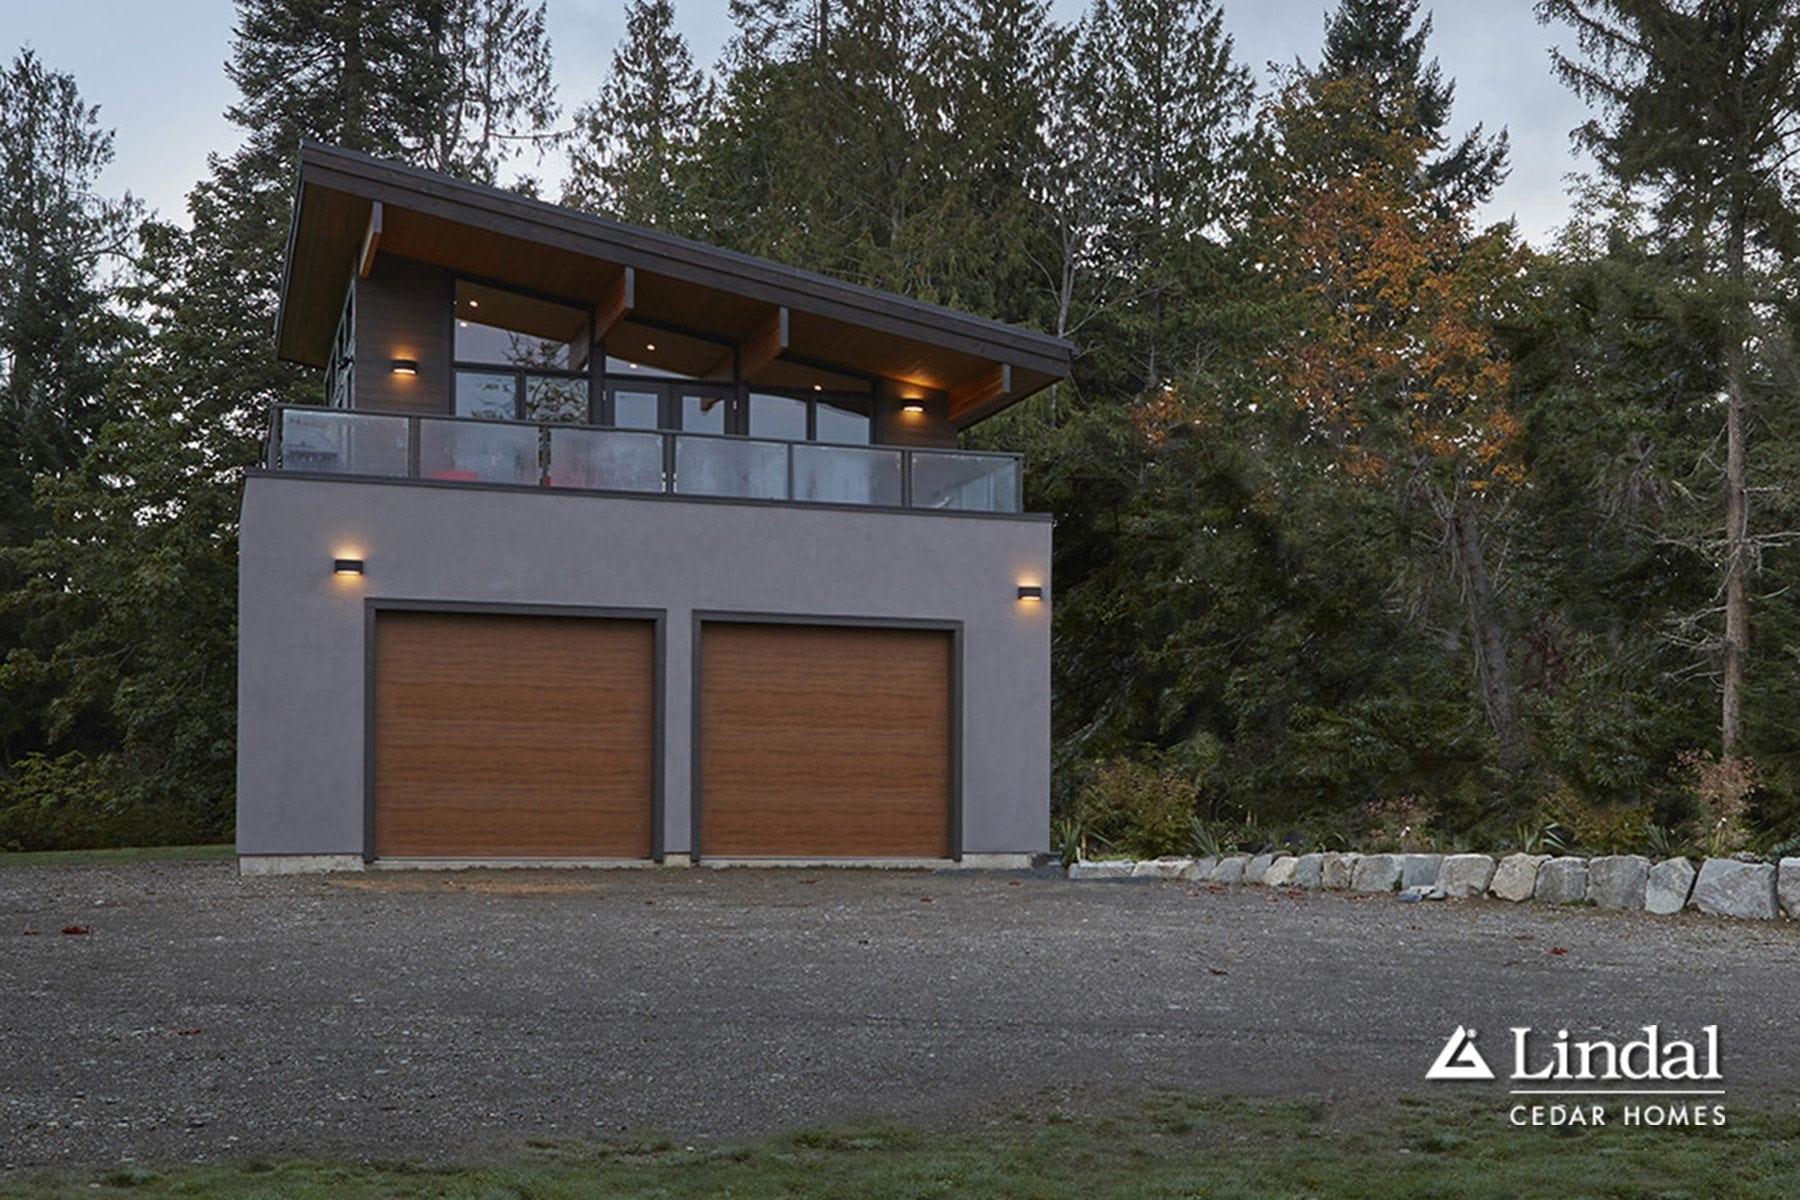 Seattle dadu seattle adu backyard cottages small homes for Lindal cedar home plans